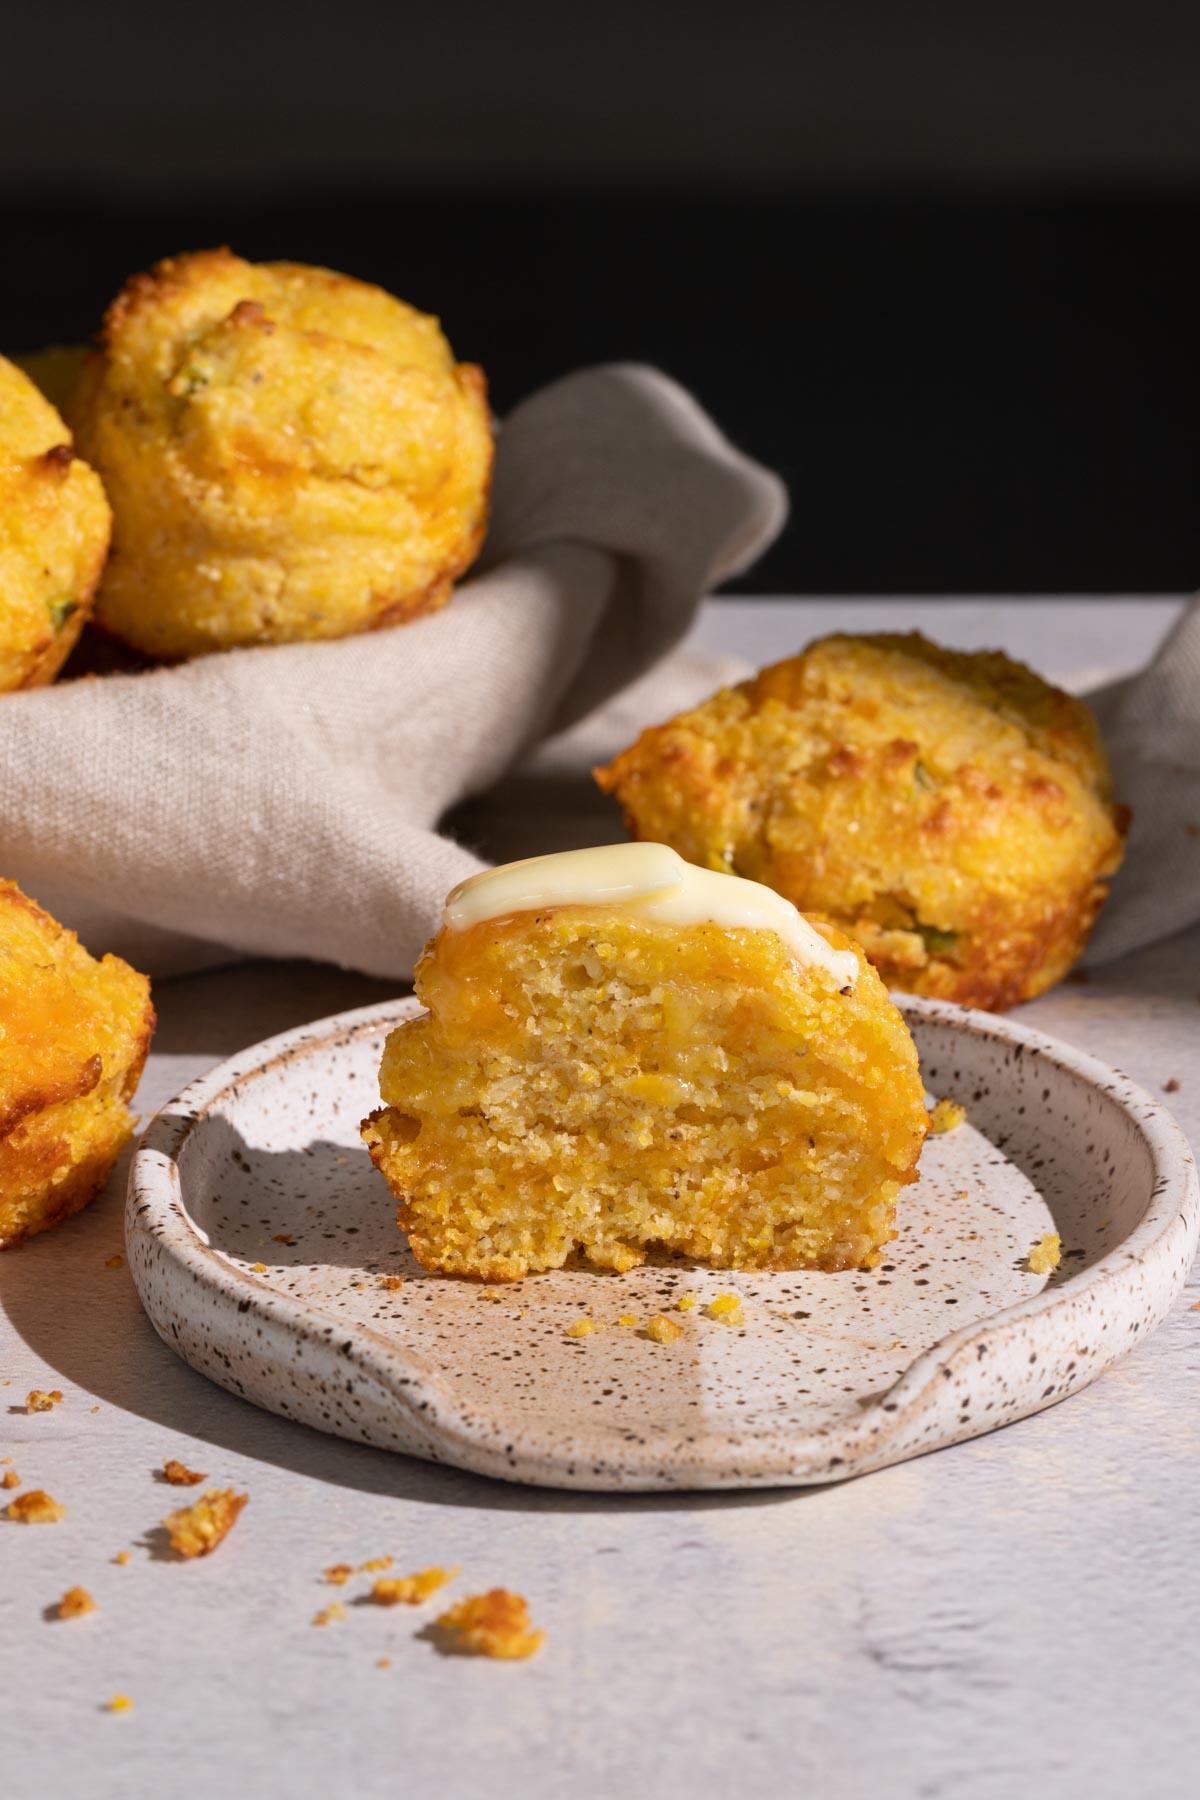 Jalapeno cheddar cornbread muffin on a plate cut in half